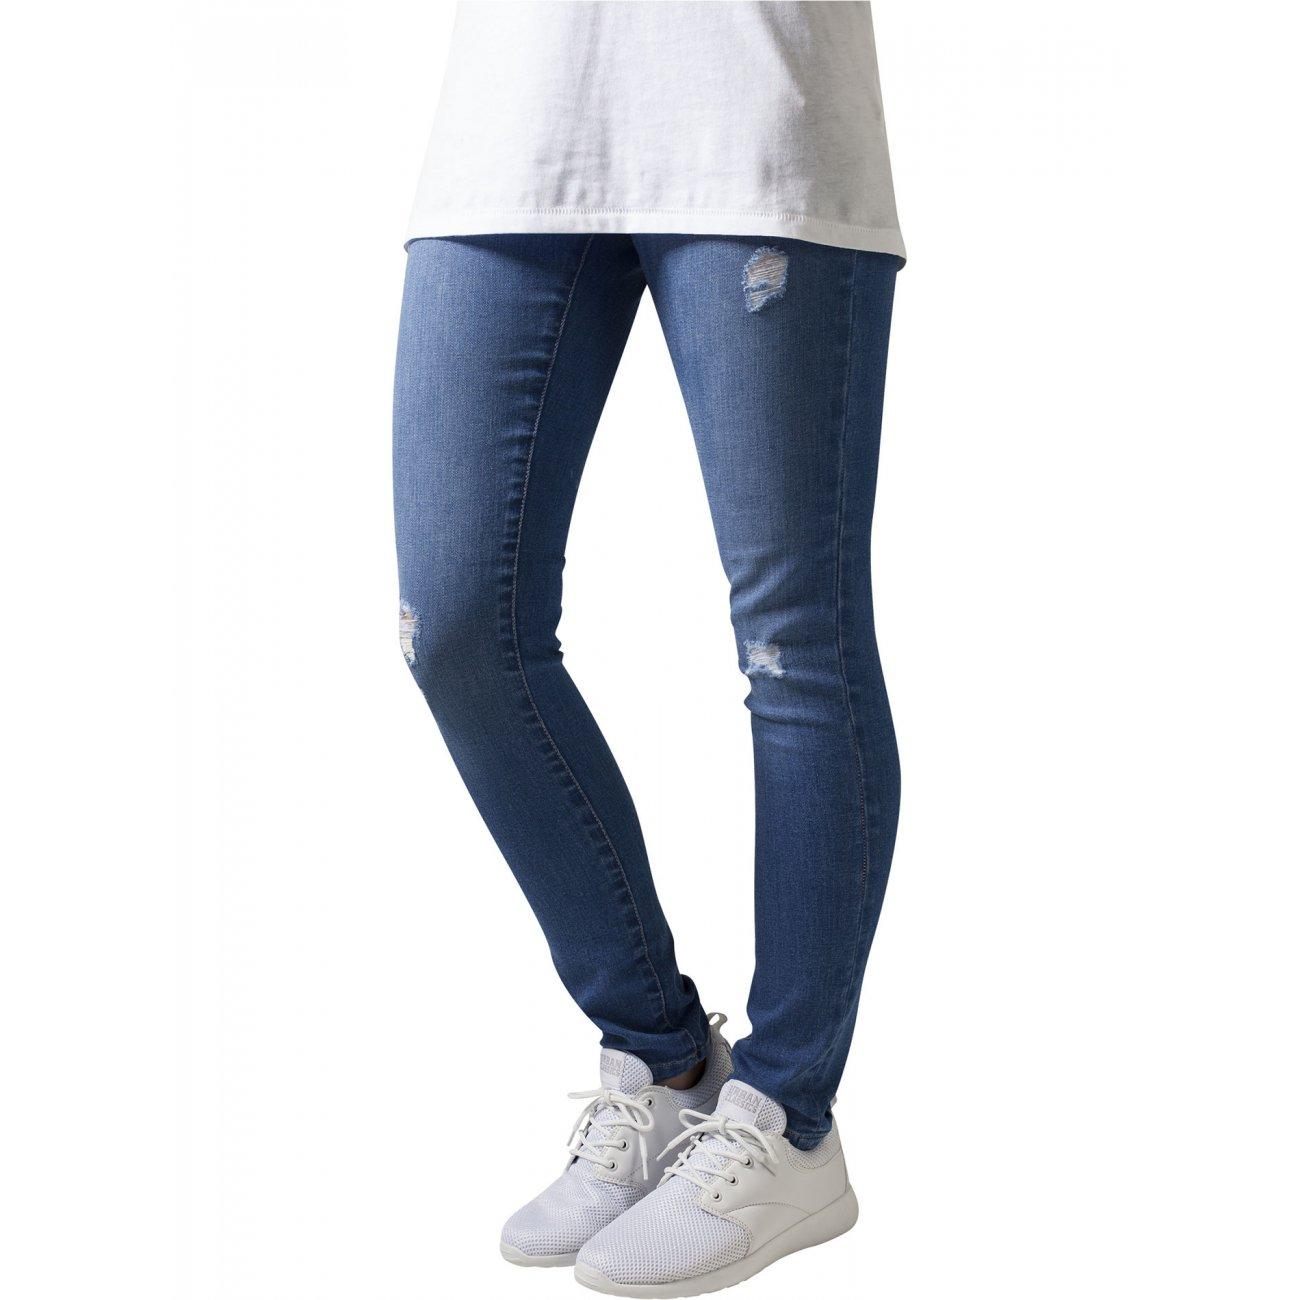 urban classics jeanshose damen ripped destroyed look tb 1362. Black Bedroom Furniture Sets. Home Design Ideas